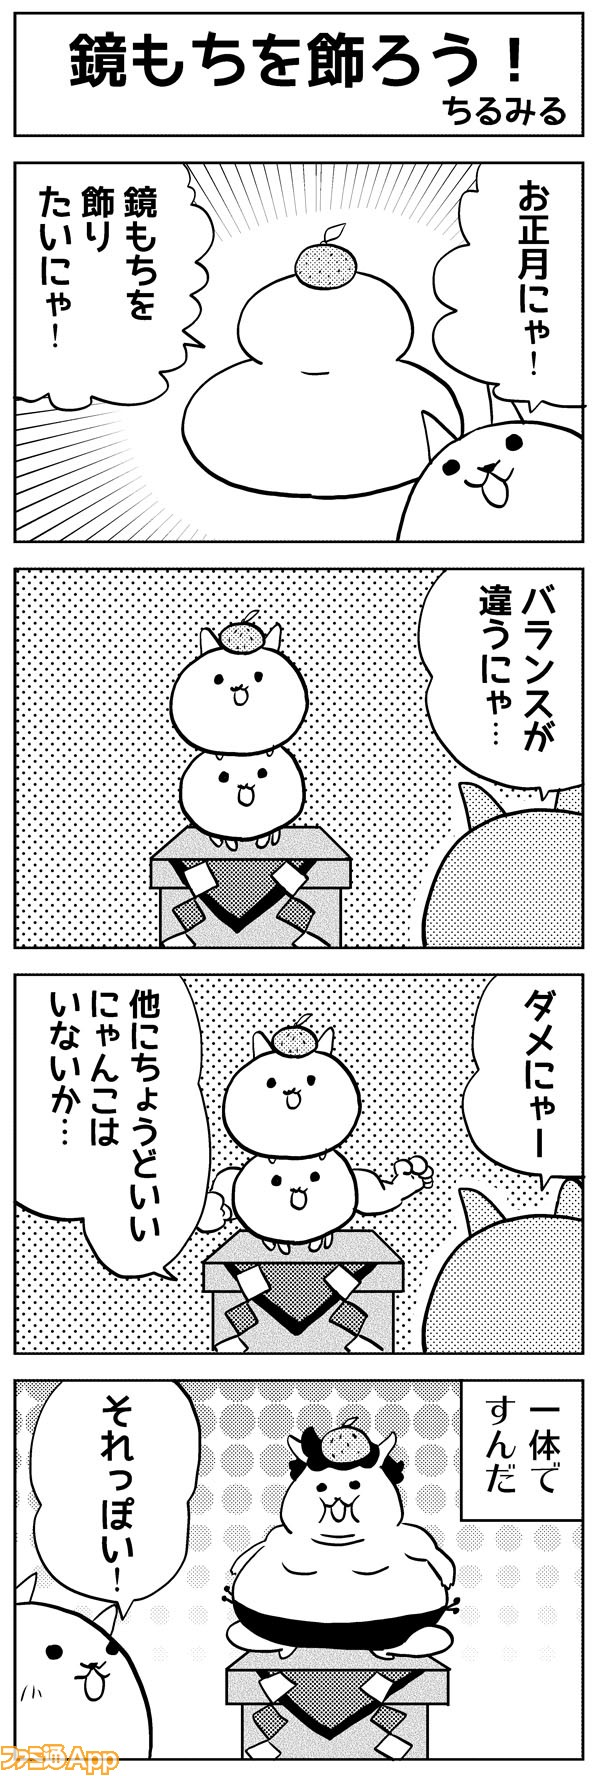 12chiru_003